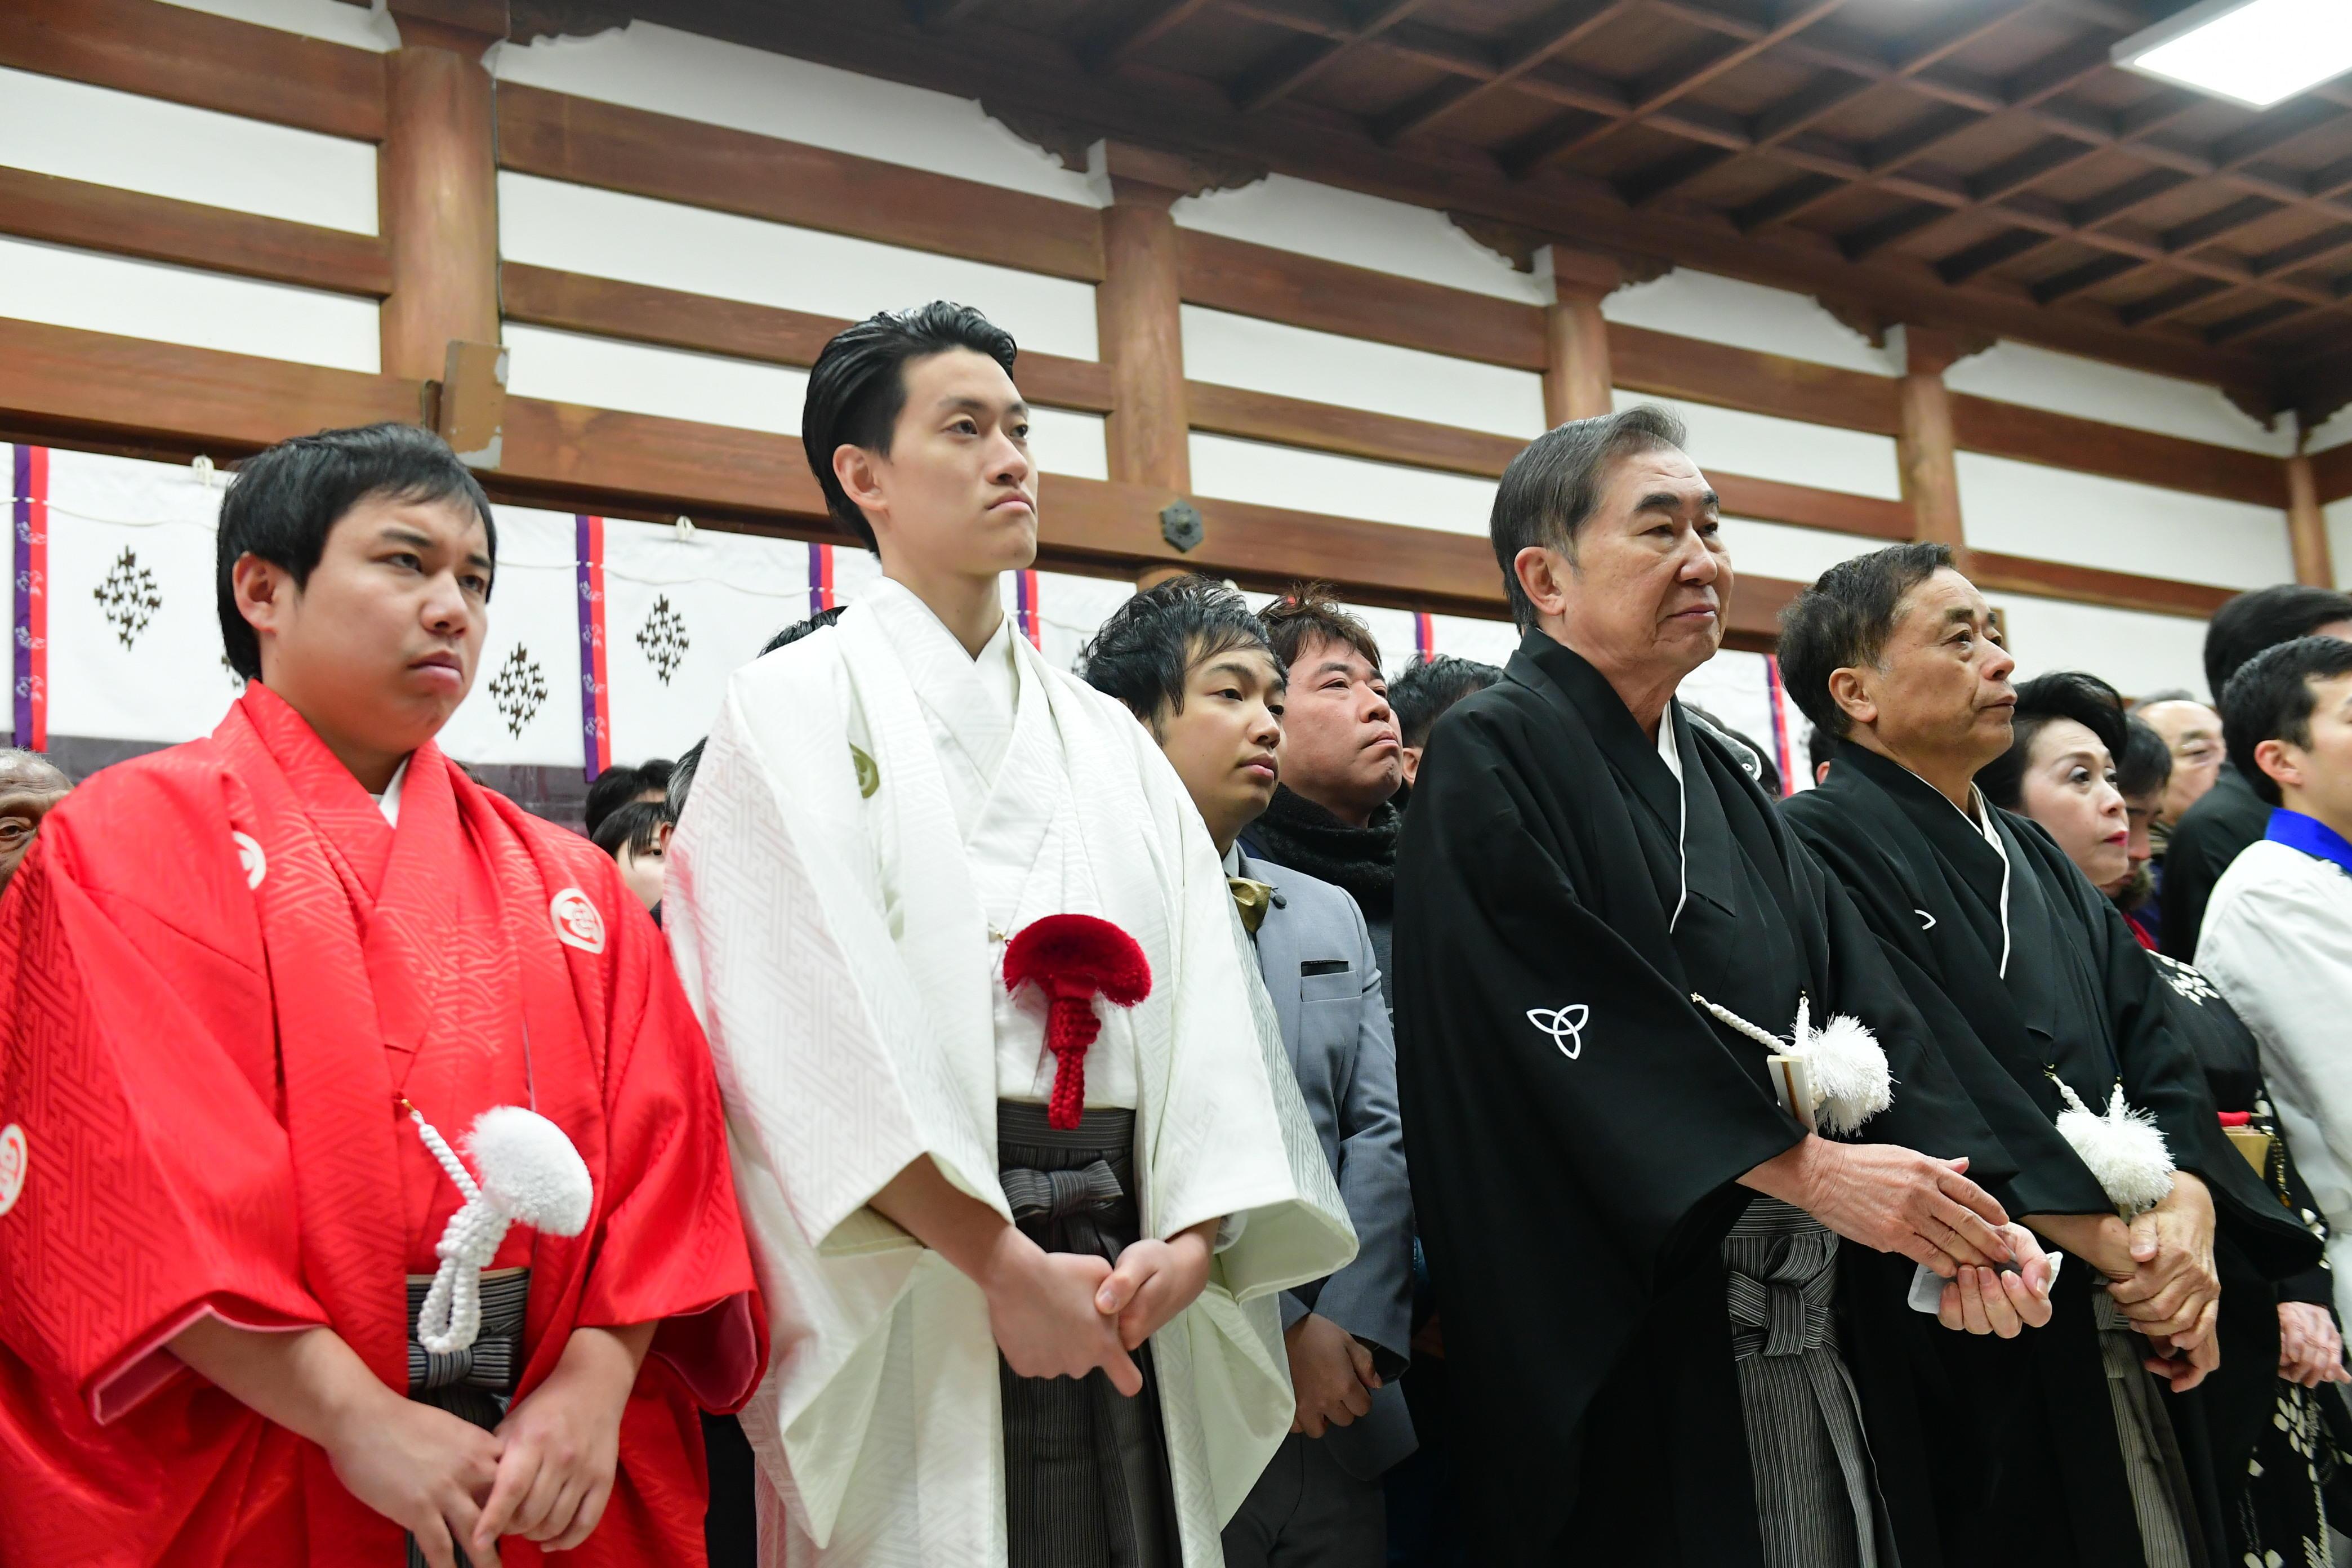 http://news.yoshimoto.co.jp/20190110194652-283d08a5d9f98947ed1bcde61bb27af6e33c3ba5.jpg